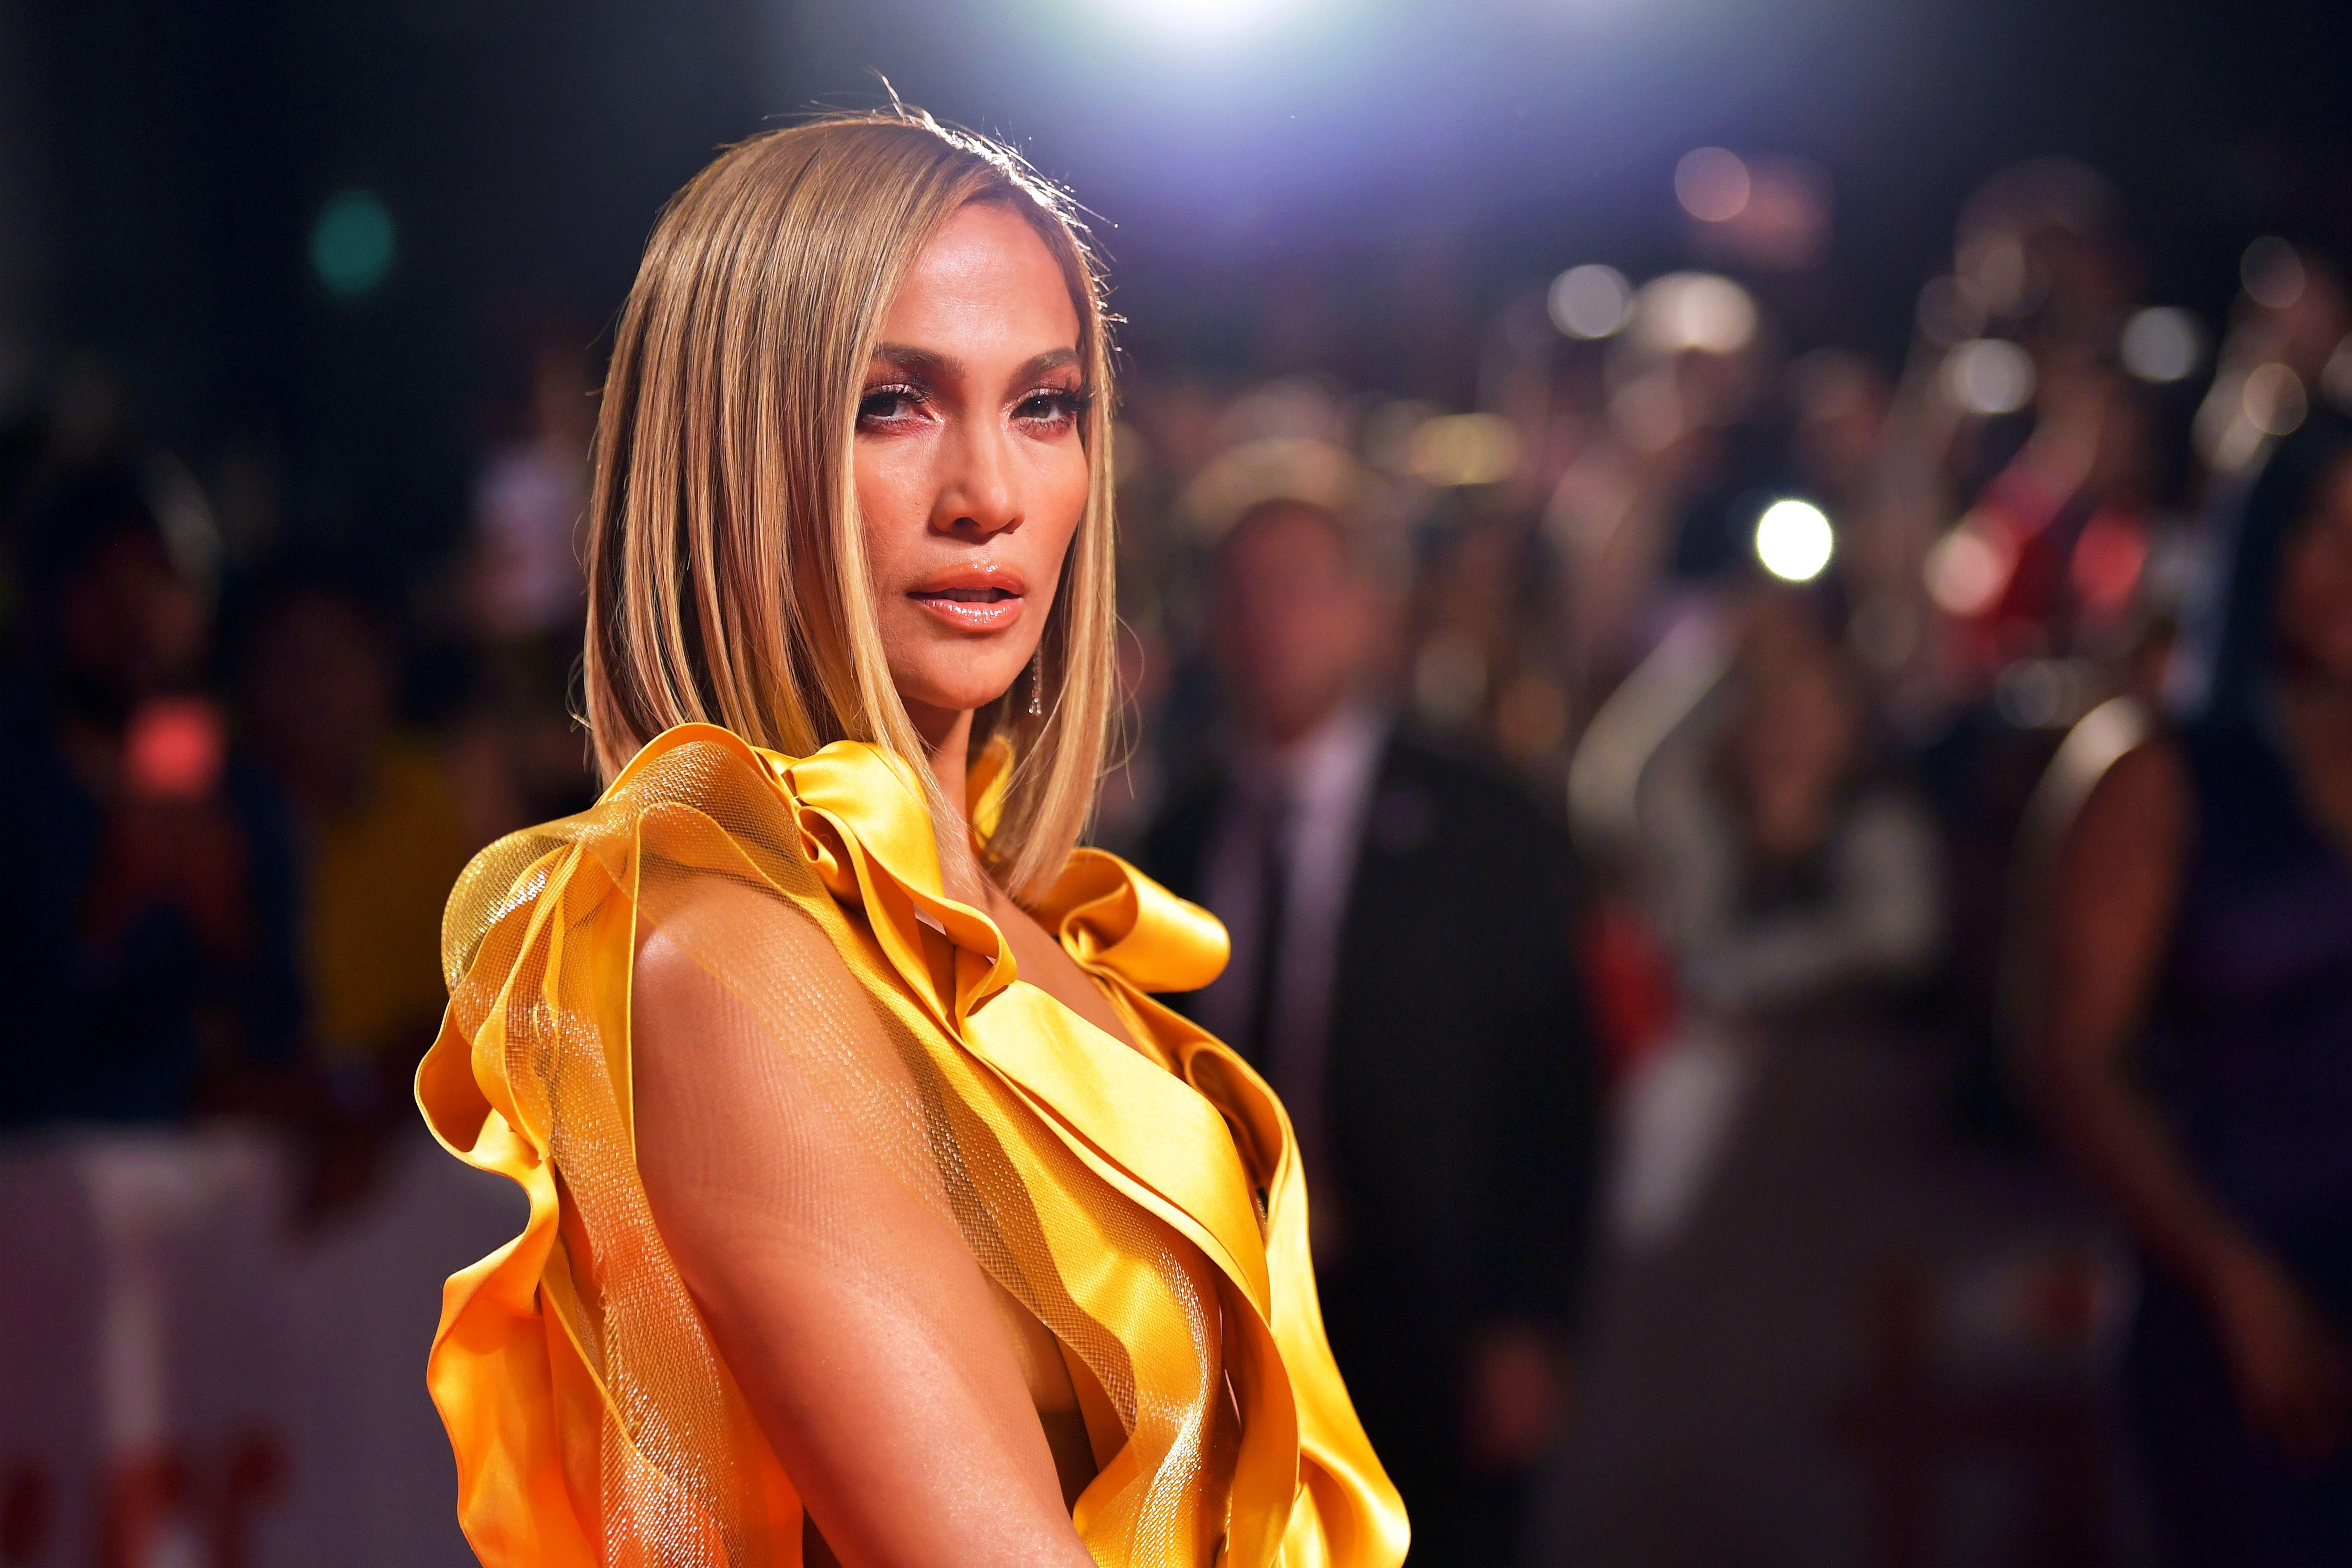 Jennifer Lopez Just Debuted a Sleek Seasonal Bob You'll Want to Copy